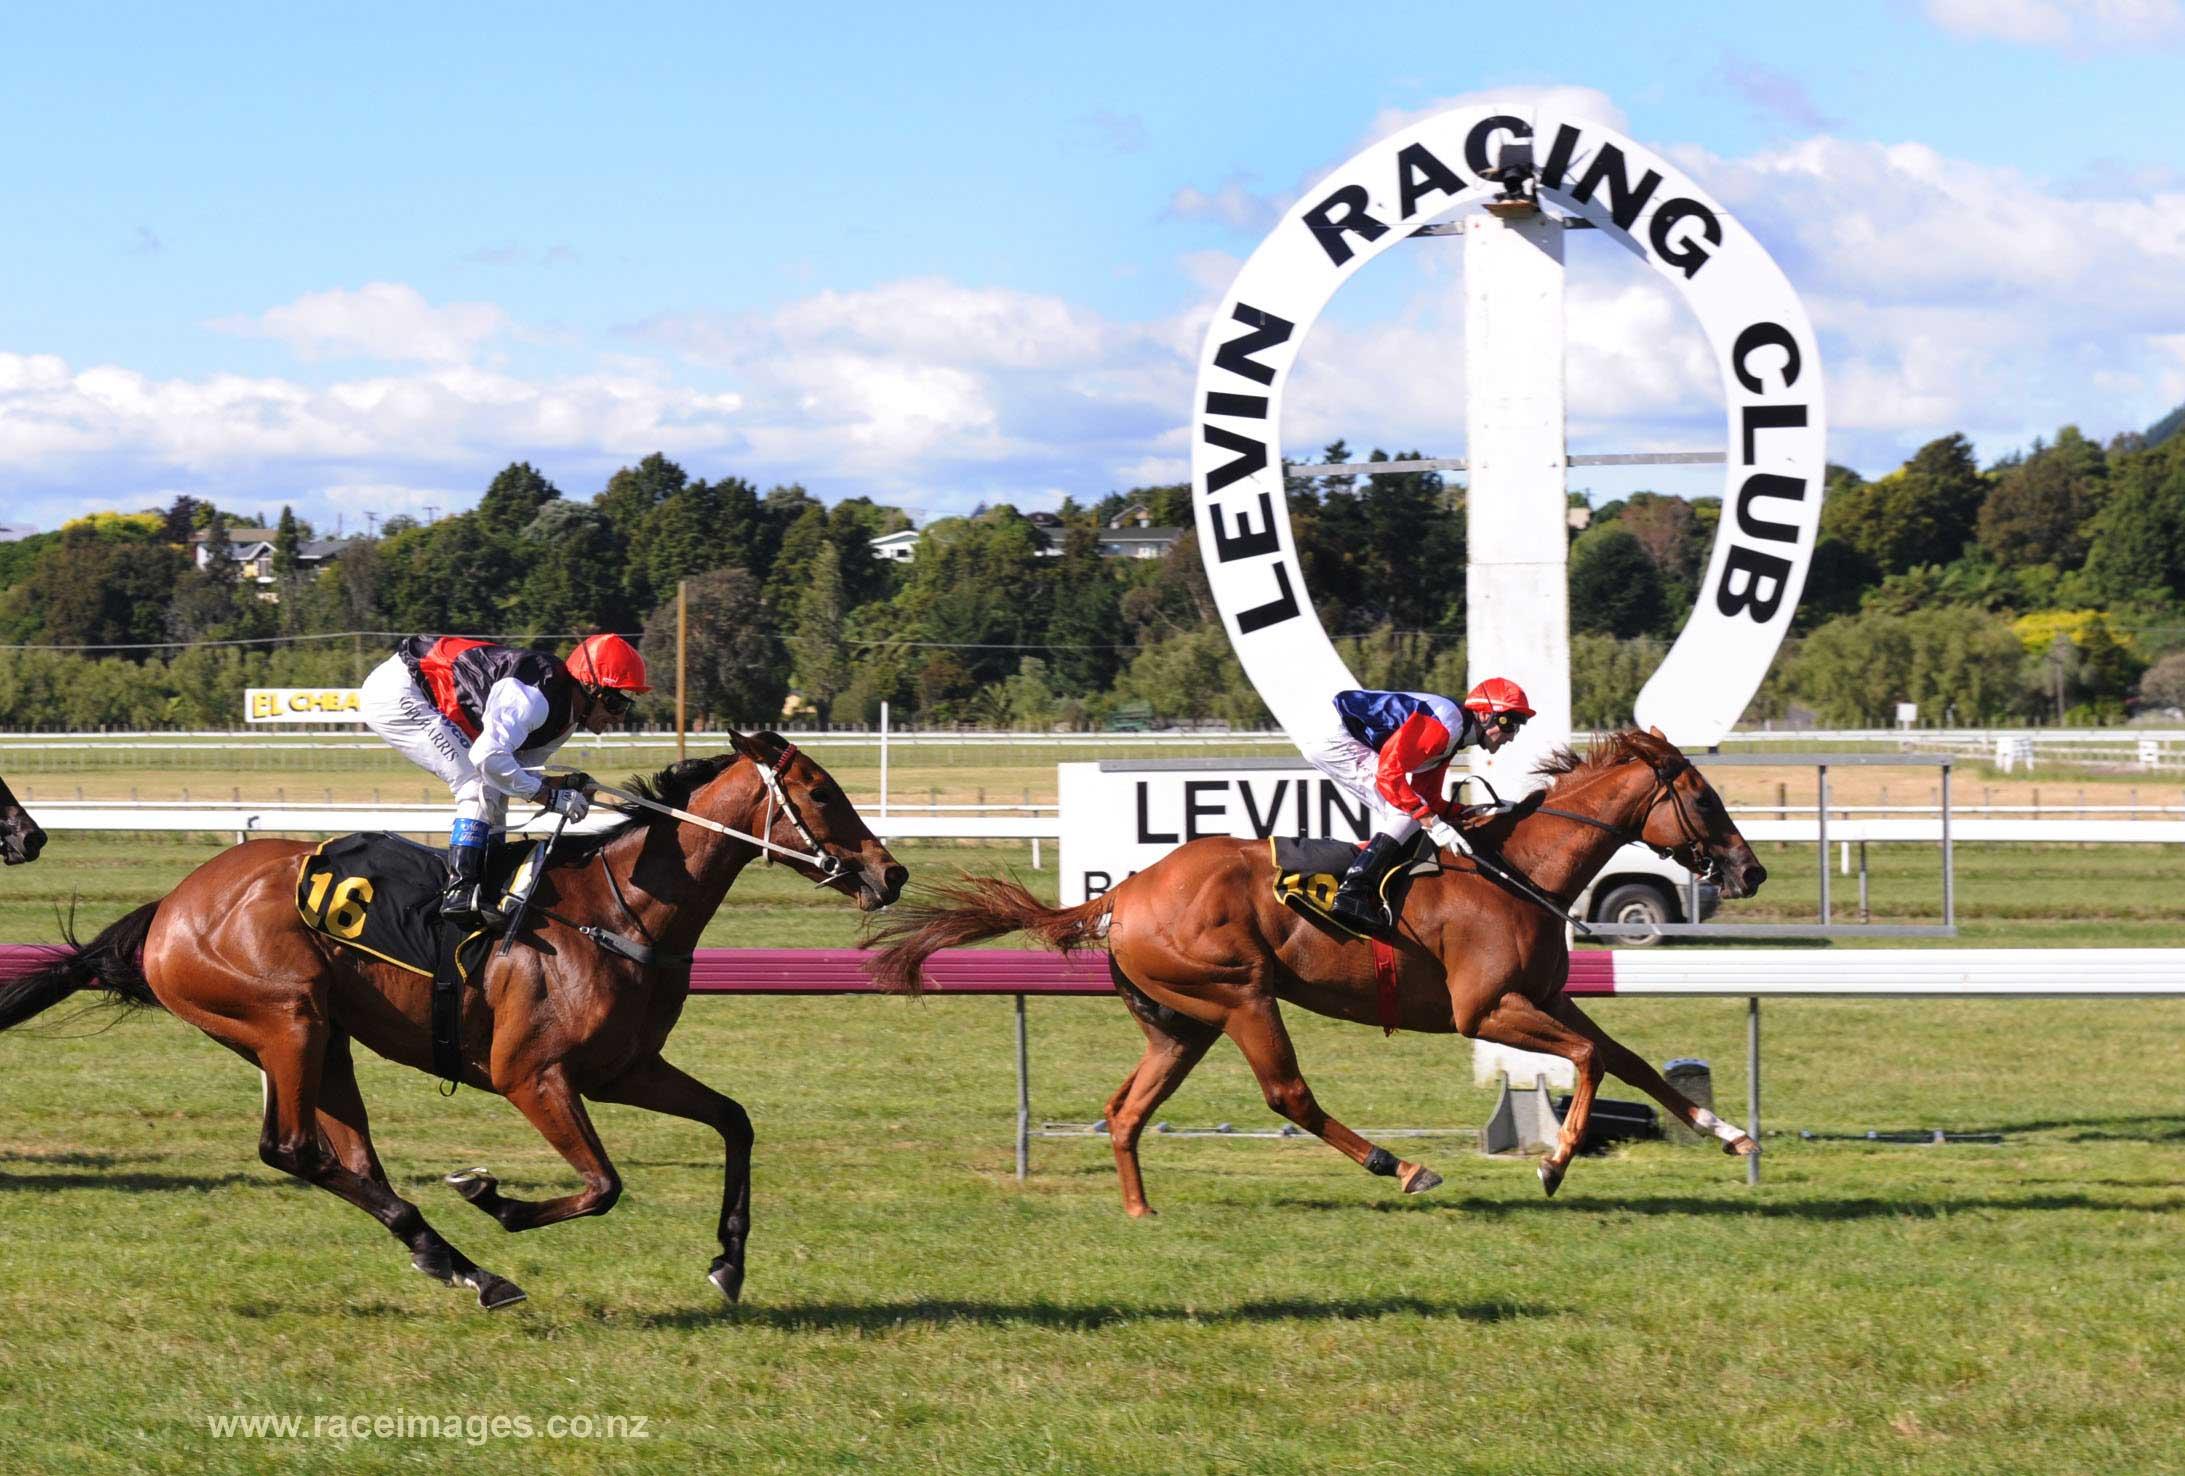 horse-racing-3.jpg